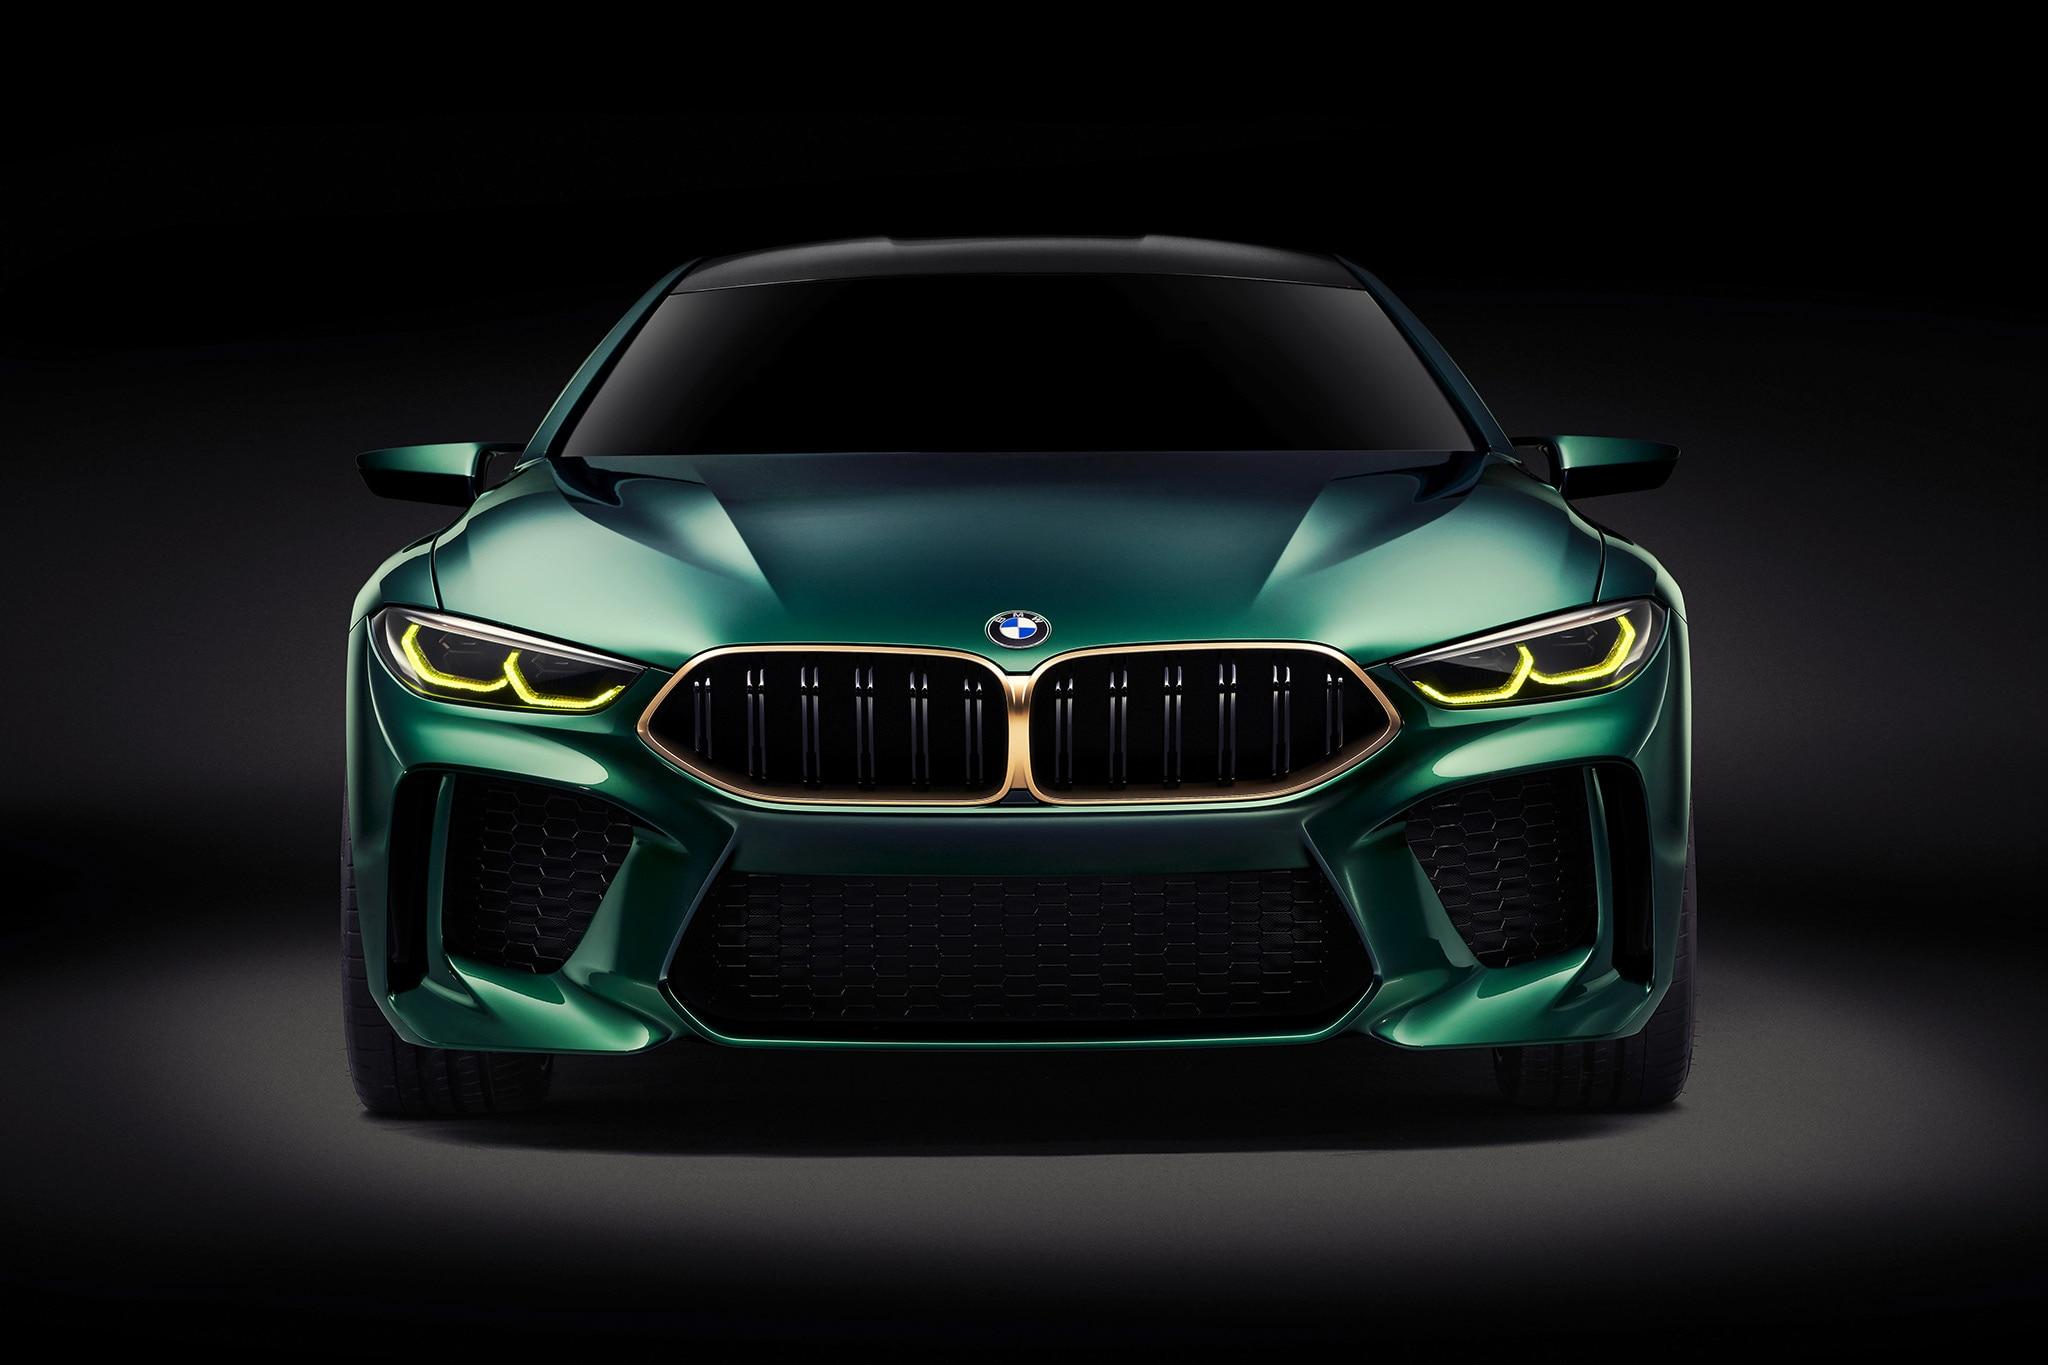 Bmw 320i 2019 >> Four-Door BMW Concept M8 Gran Coupe Concept Unveiled in Geneva | Automobile Magazine